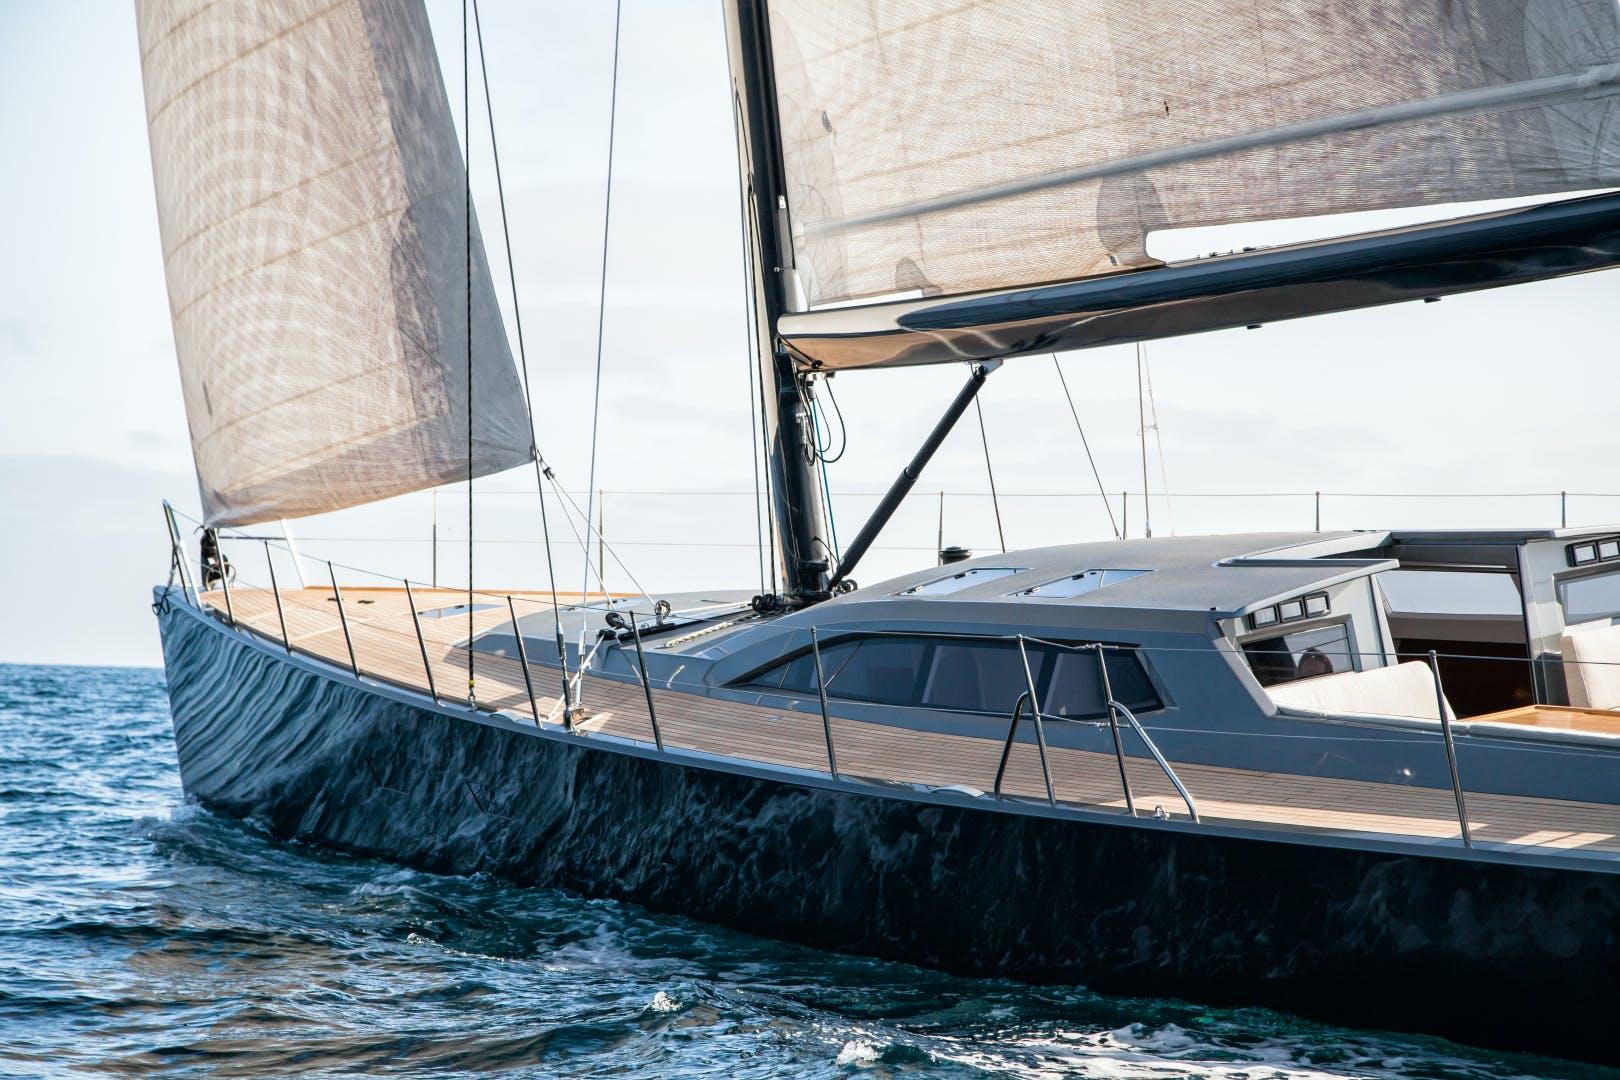 1996 Goetz / Derecktor 77' Custom Sparkman & Stephens Designed Performance Sailing Yacht AANDEEL | Picture 6 of 24